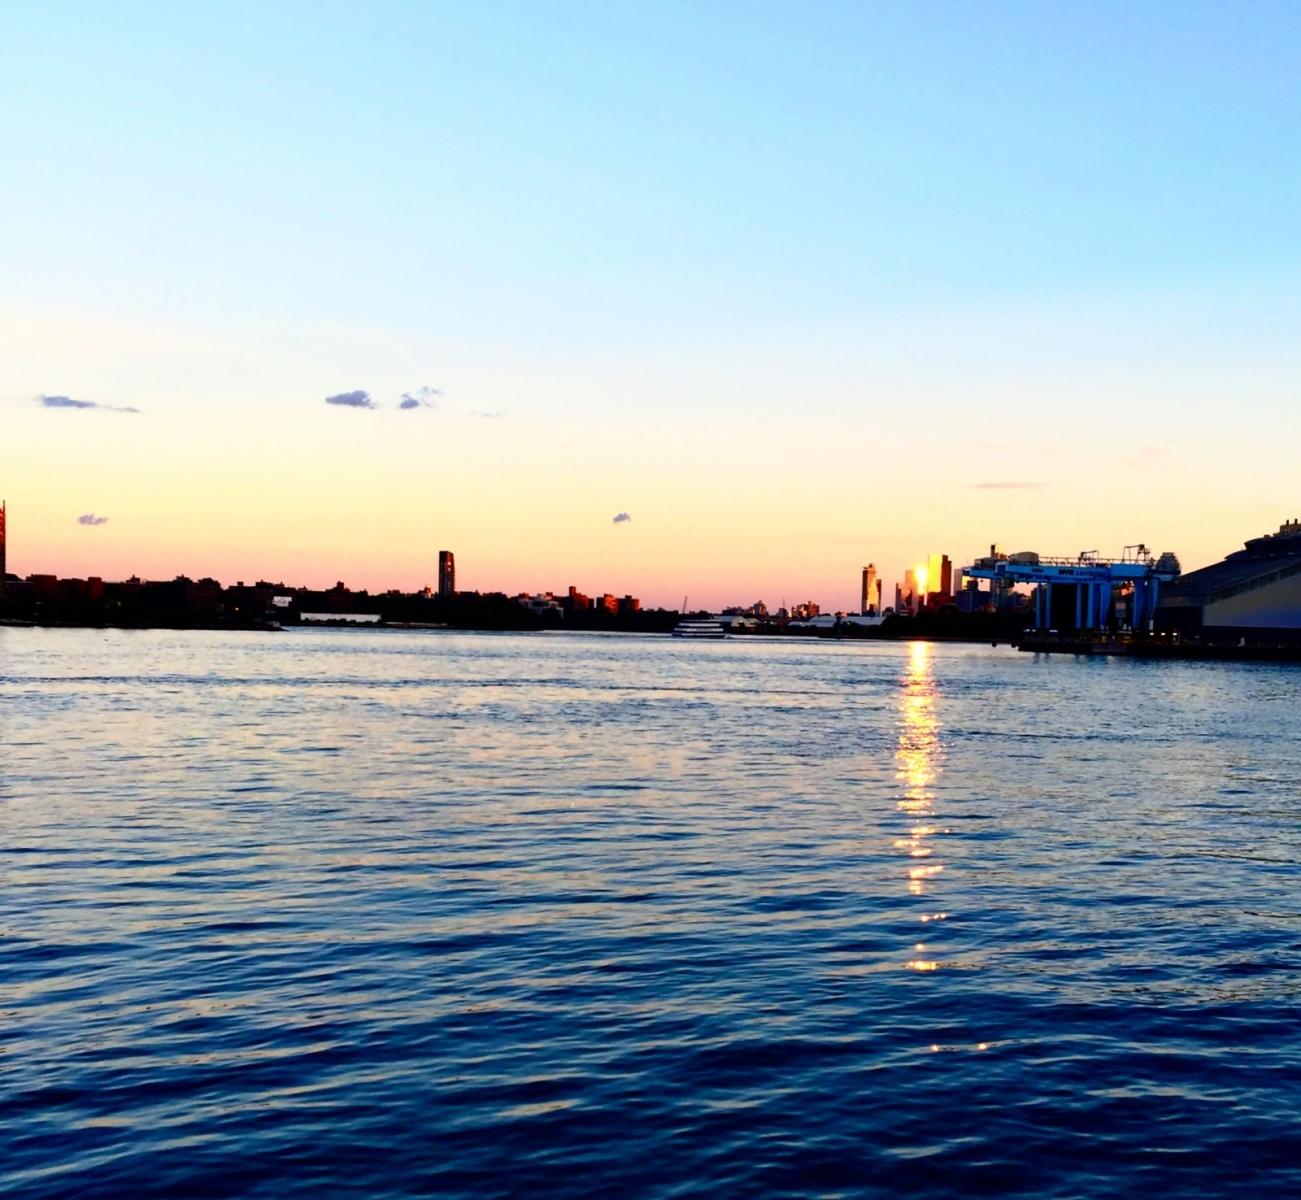 回头一瞅 美在东河 Manhattan East River_图1-25